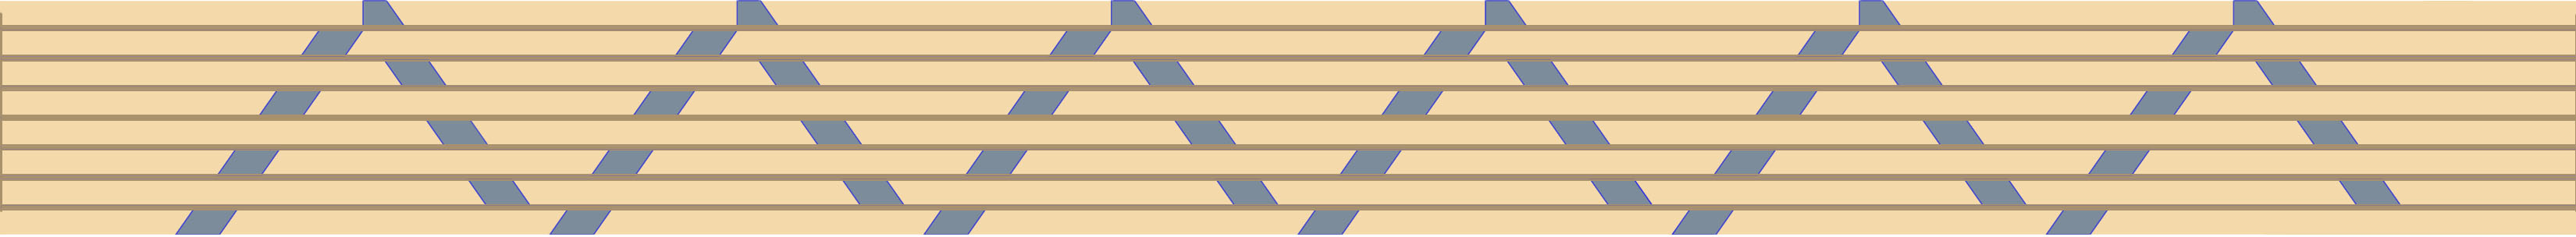 Hatband Pattern.jpg